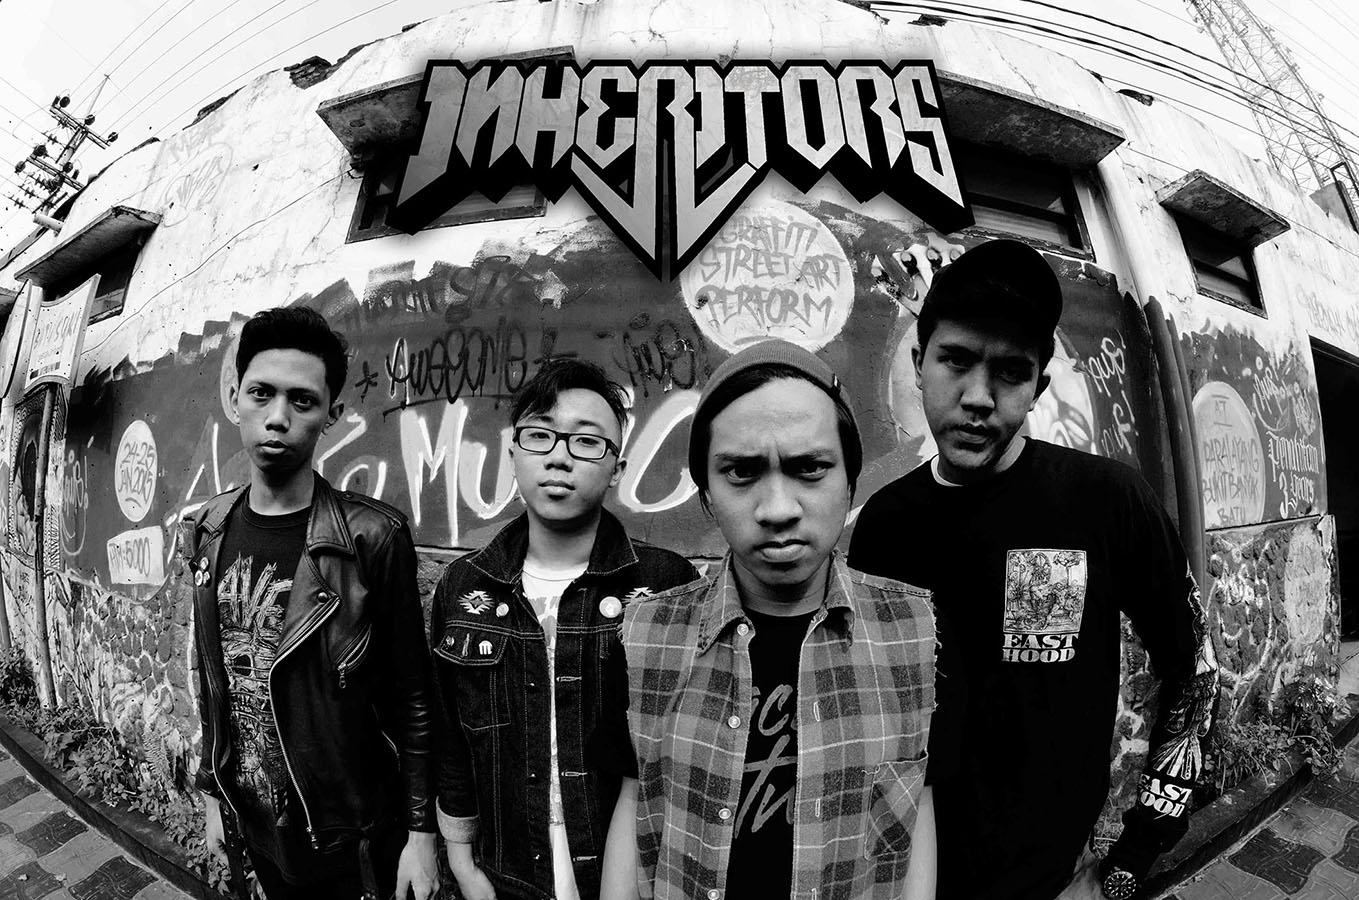 Inheritors - The Metal Rebel